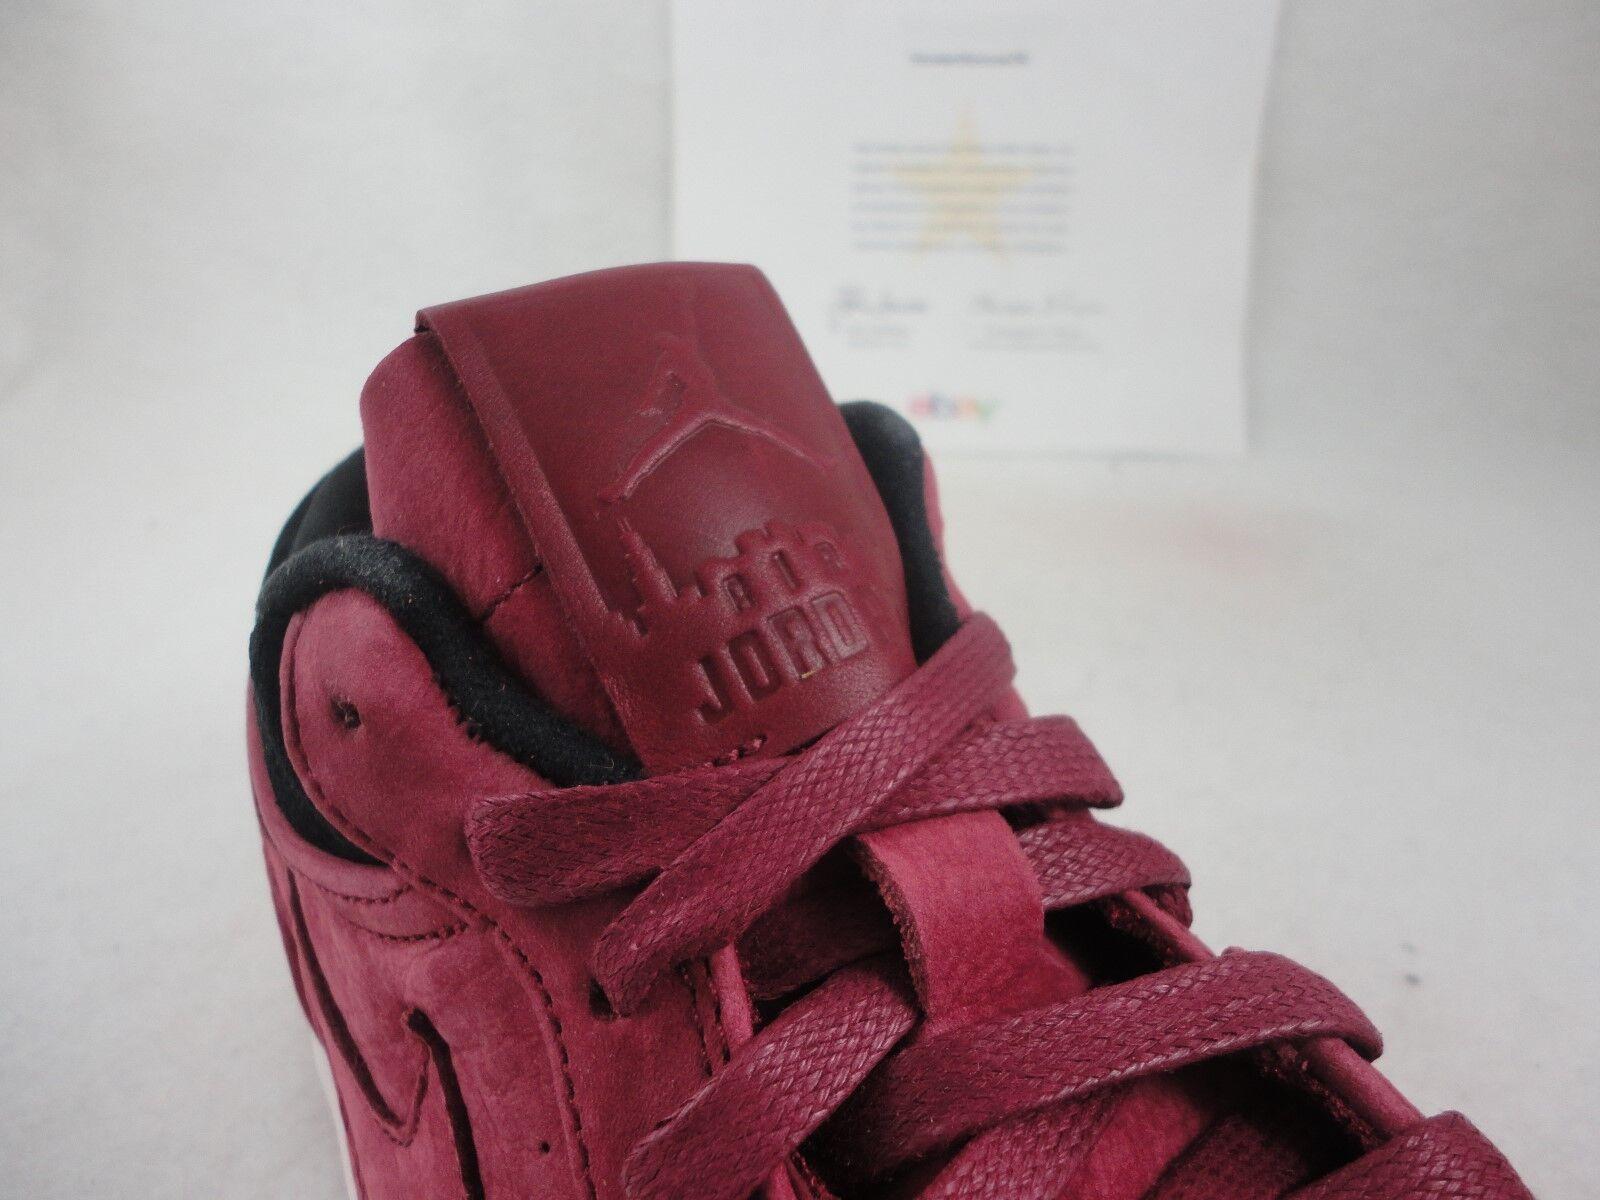 Nike Air Jordan 1 baja Nouveau, equipo rojo / gimnasio por Rojo, 2018, venta al por gimnasio menor de 120, tamaño 9,5 8f7446